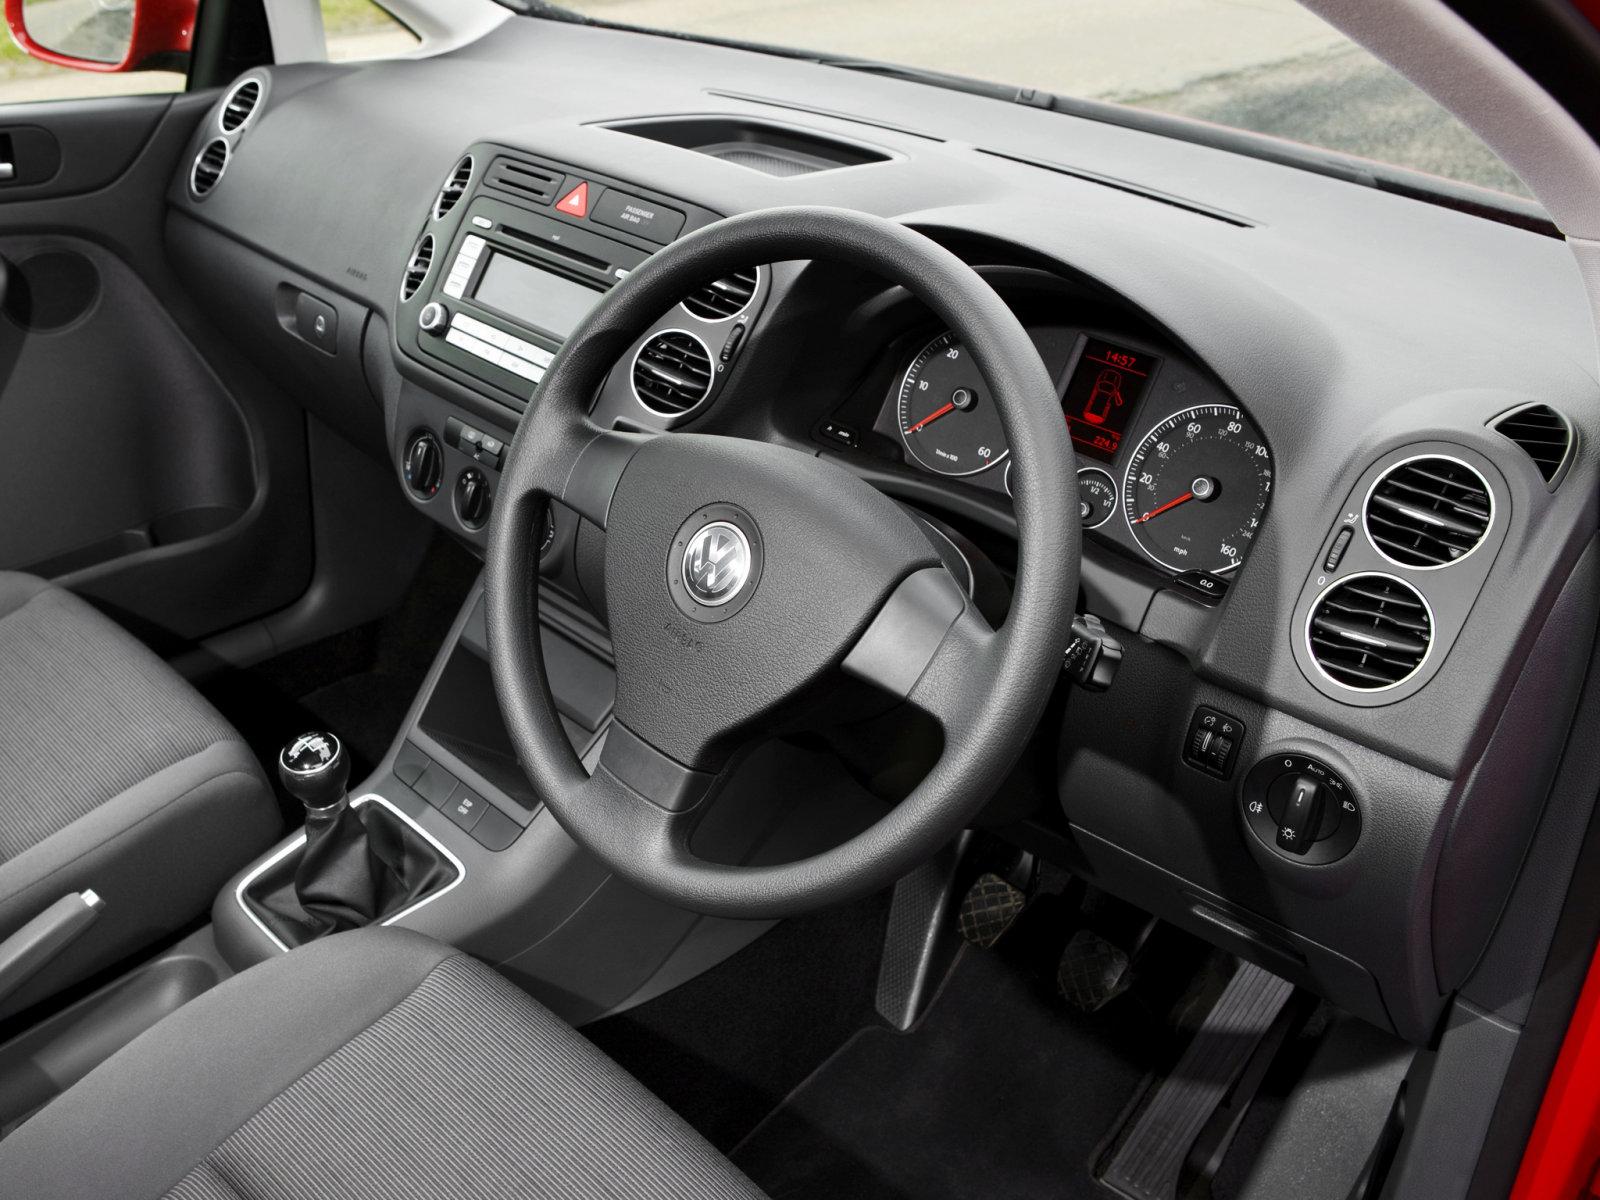 Volkswagen (Фольксваген) Golf Plus 2005-2009 г.